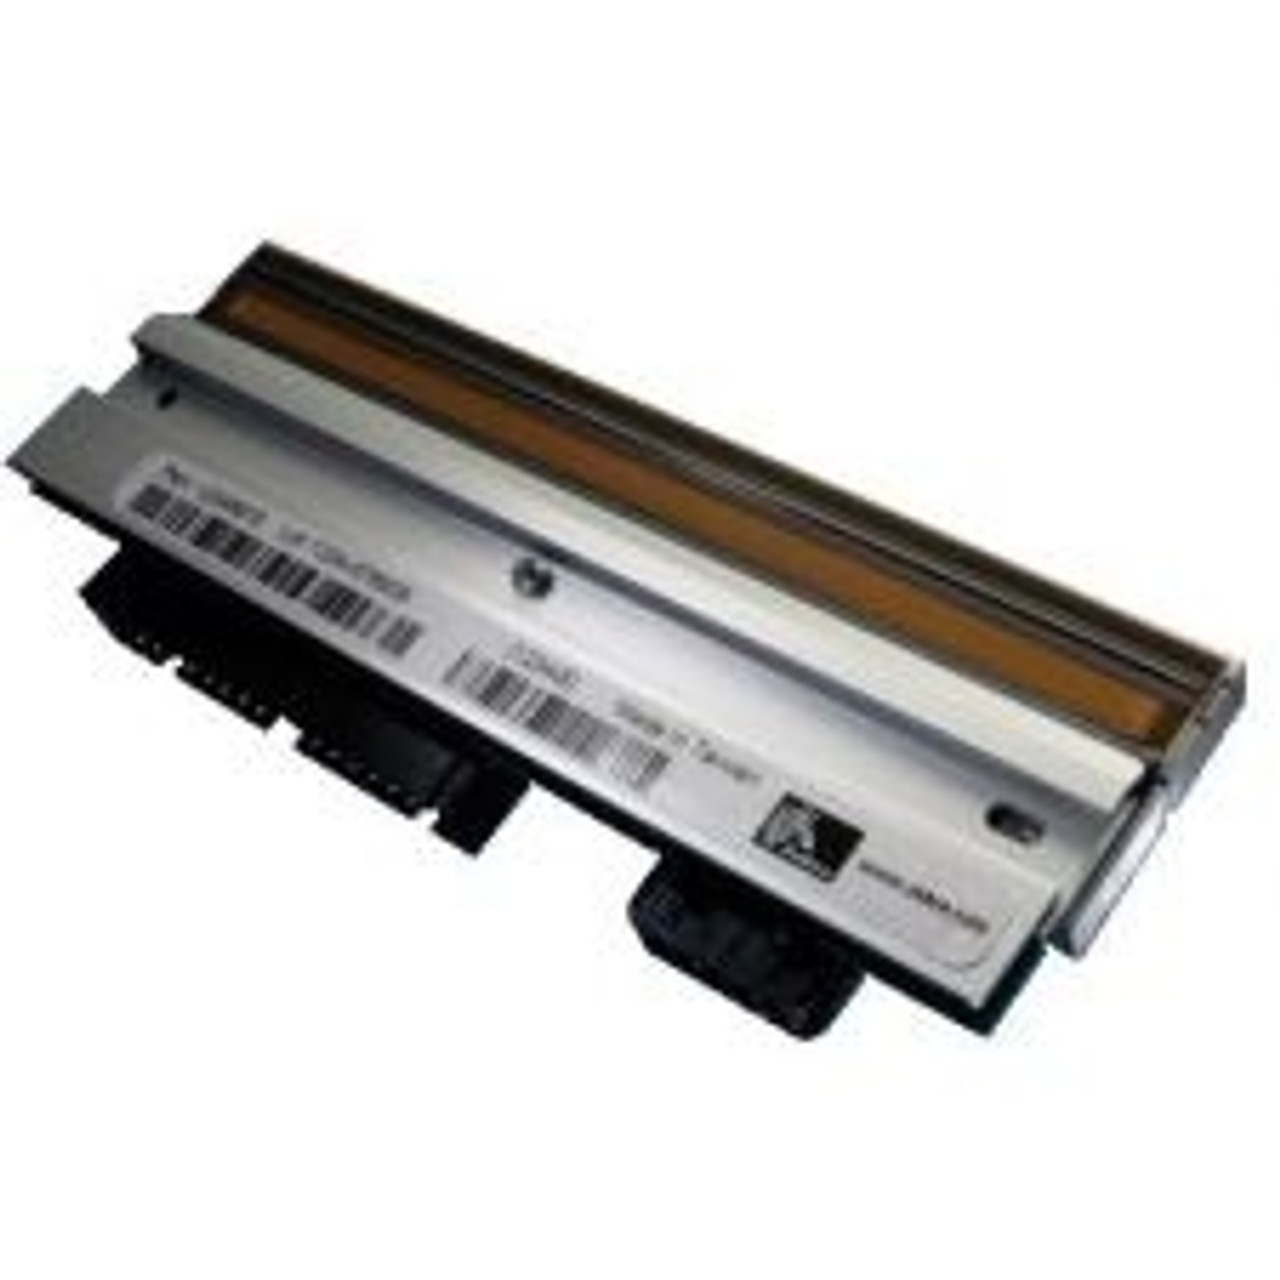 MZ 220 Printheads & Parts